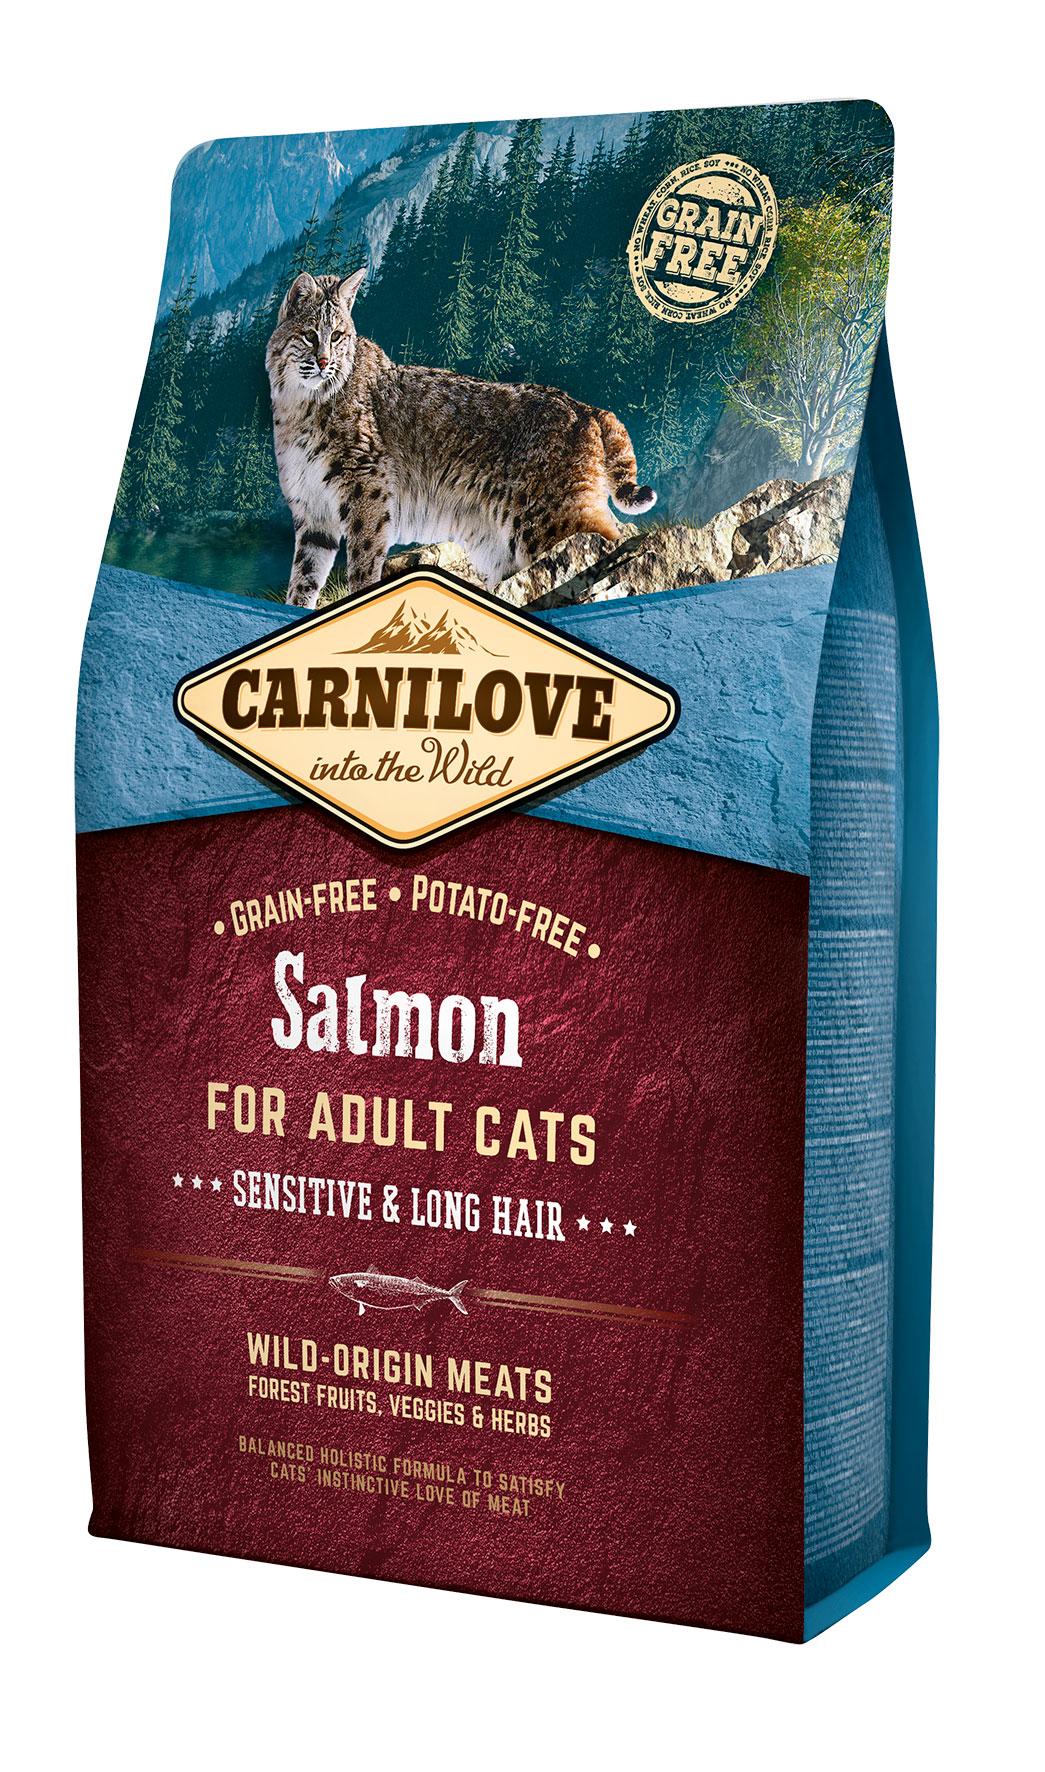 Carnilove Salmon for Adult Cats – Sensitive & Long Hair 2kg